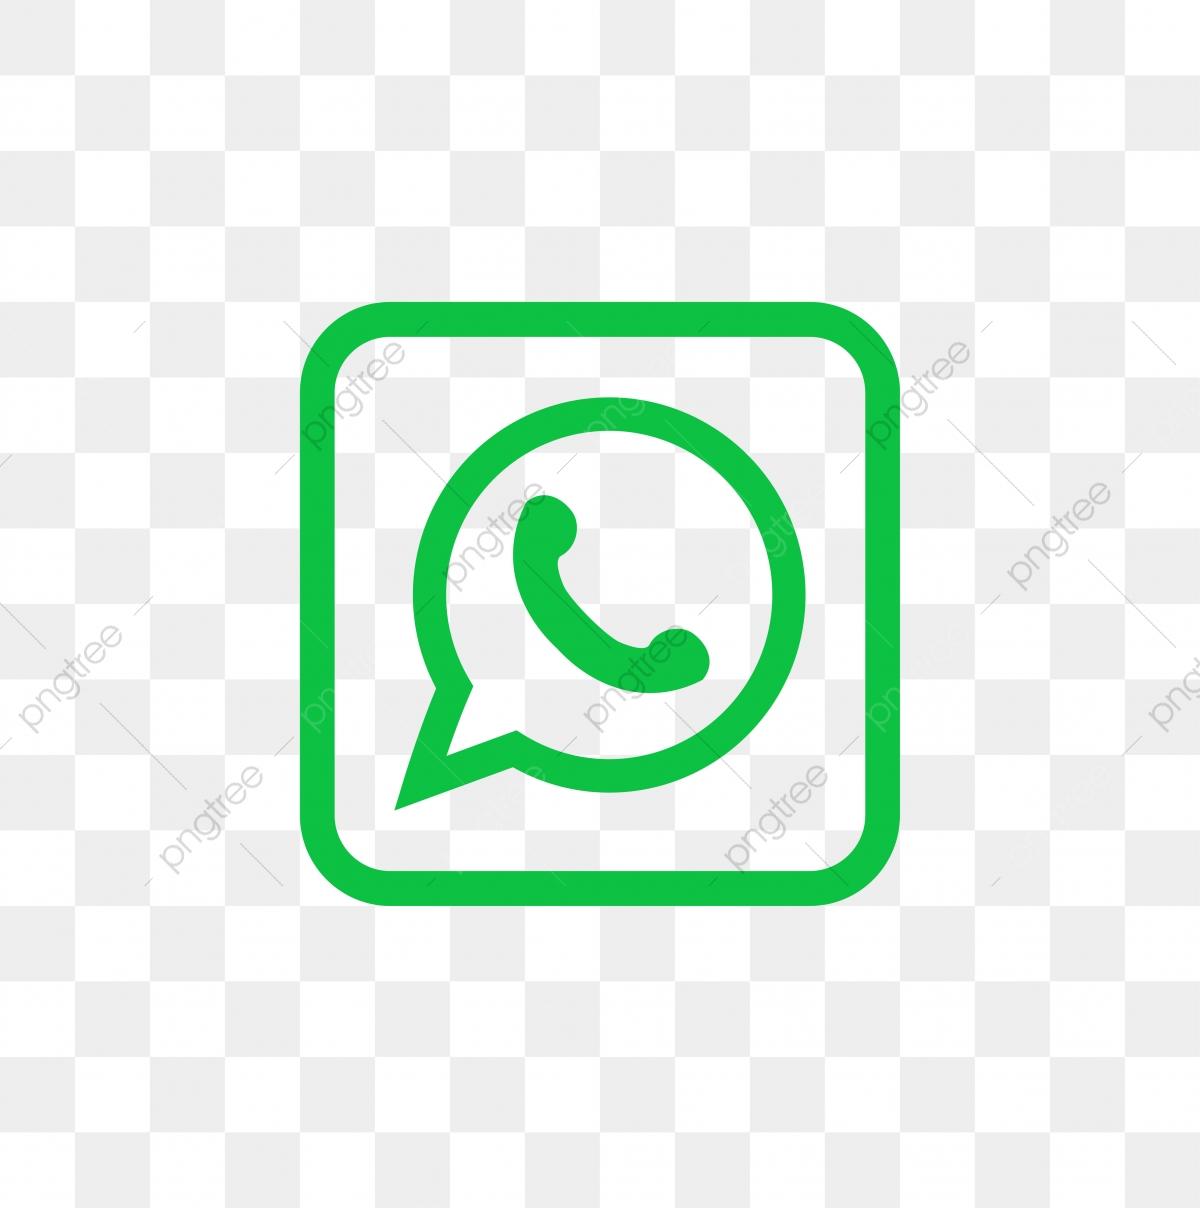 Whatsapp Social Media Icon Design Template Vector Whatsapp Logo.